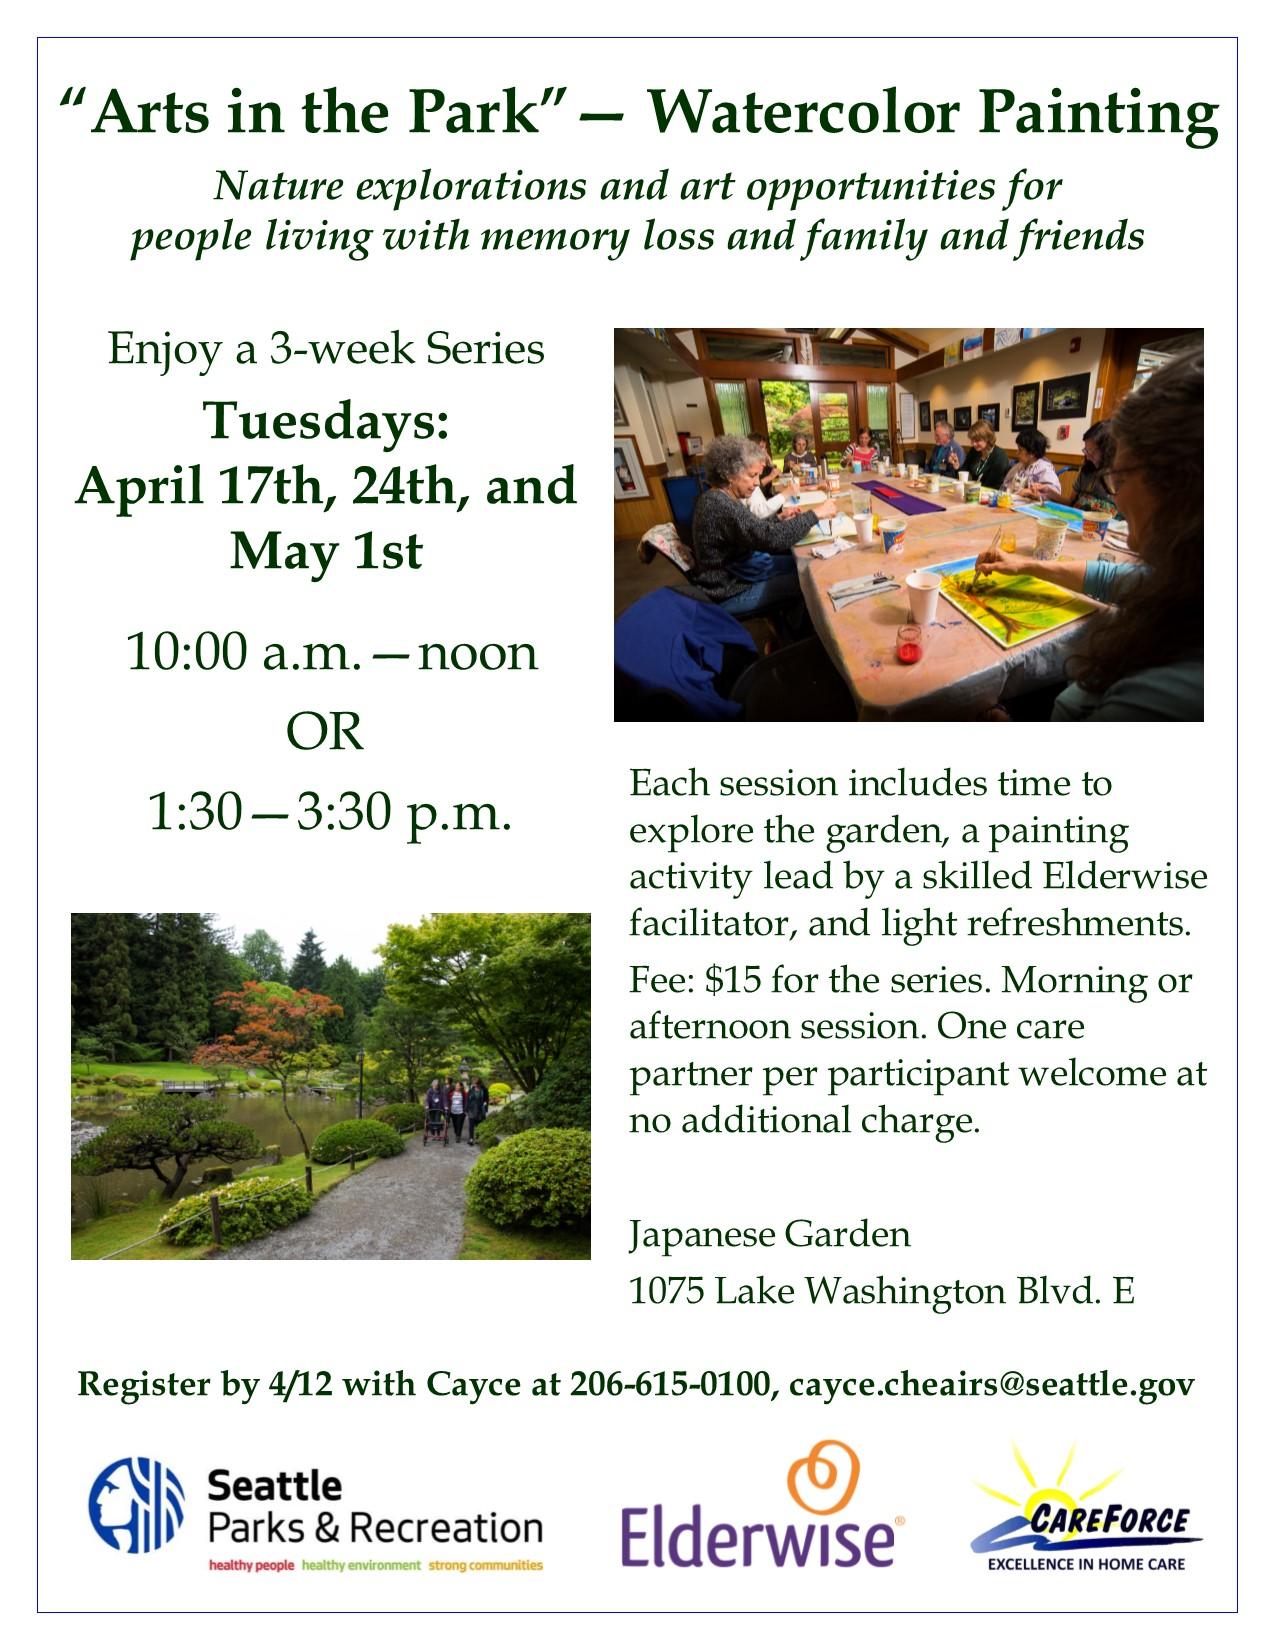 Arts in the Park Japanese Garden Flyer Spring 2018.jpg